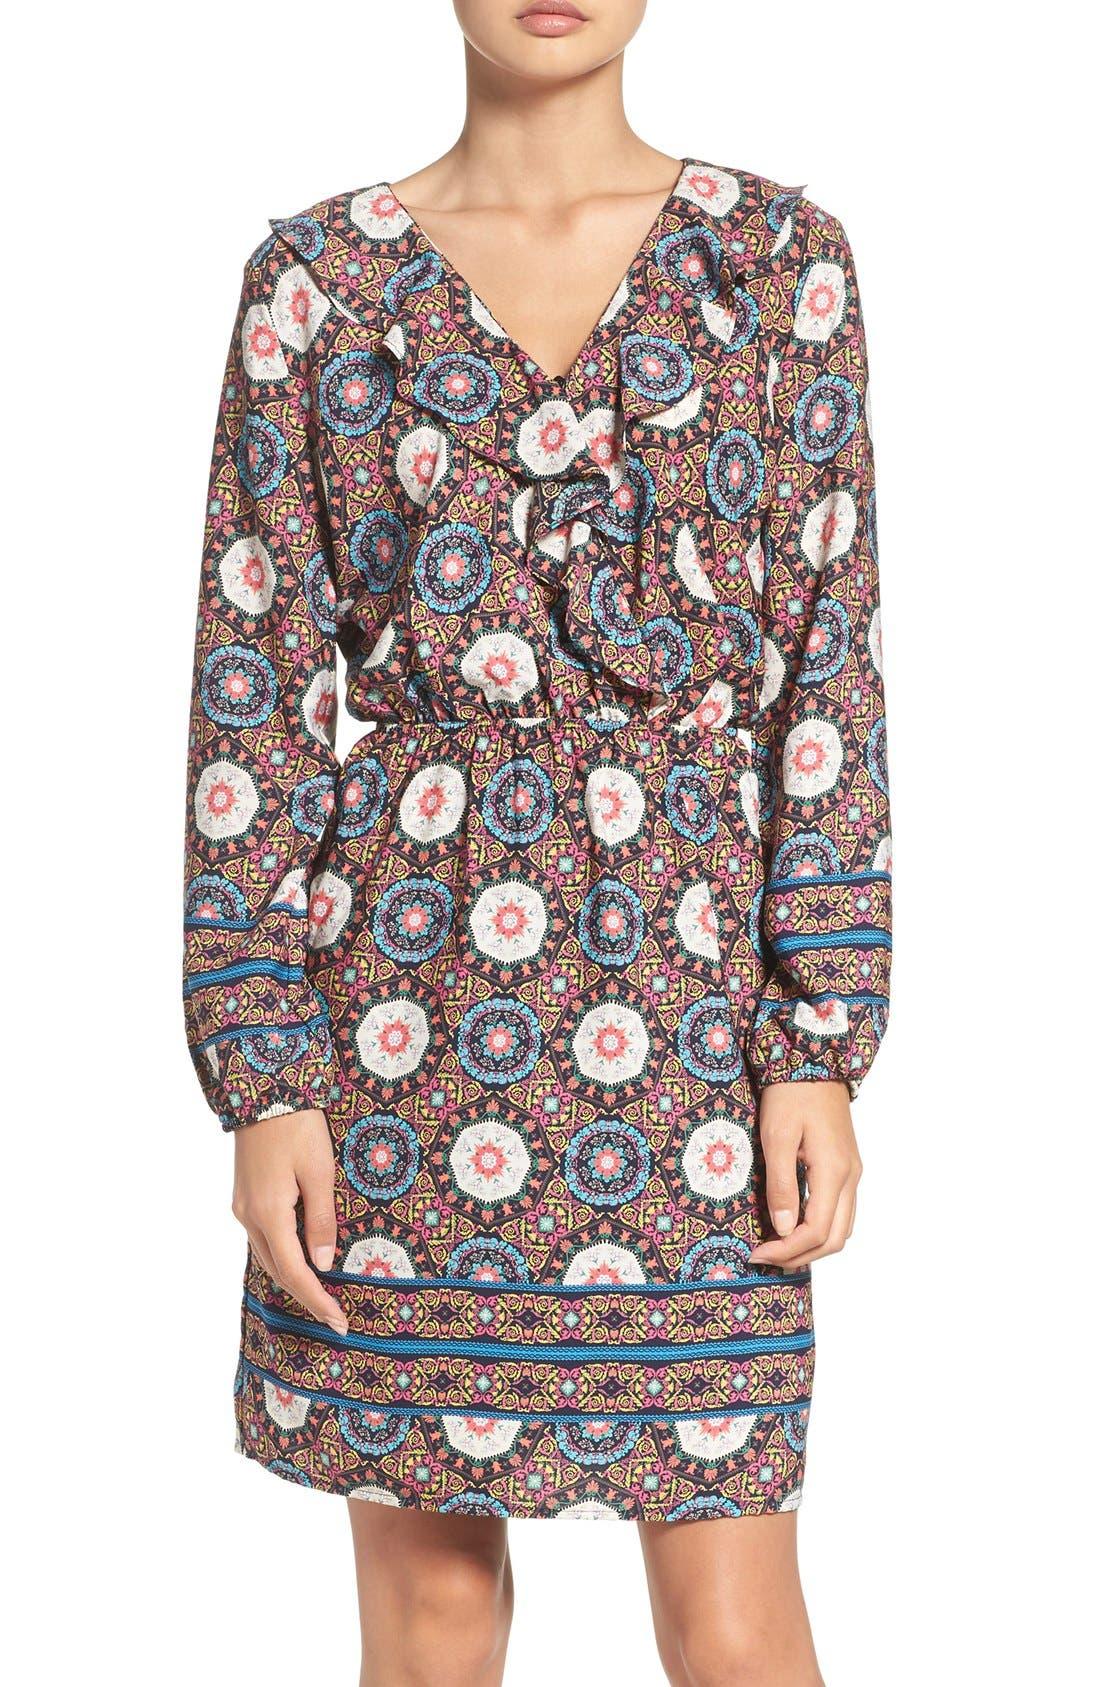 'Nadia' Ruffle Blouson Dress,                             Main thumbnail 1, color,                             409